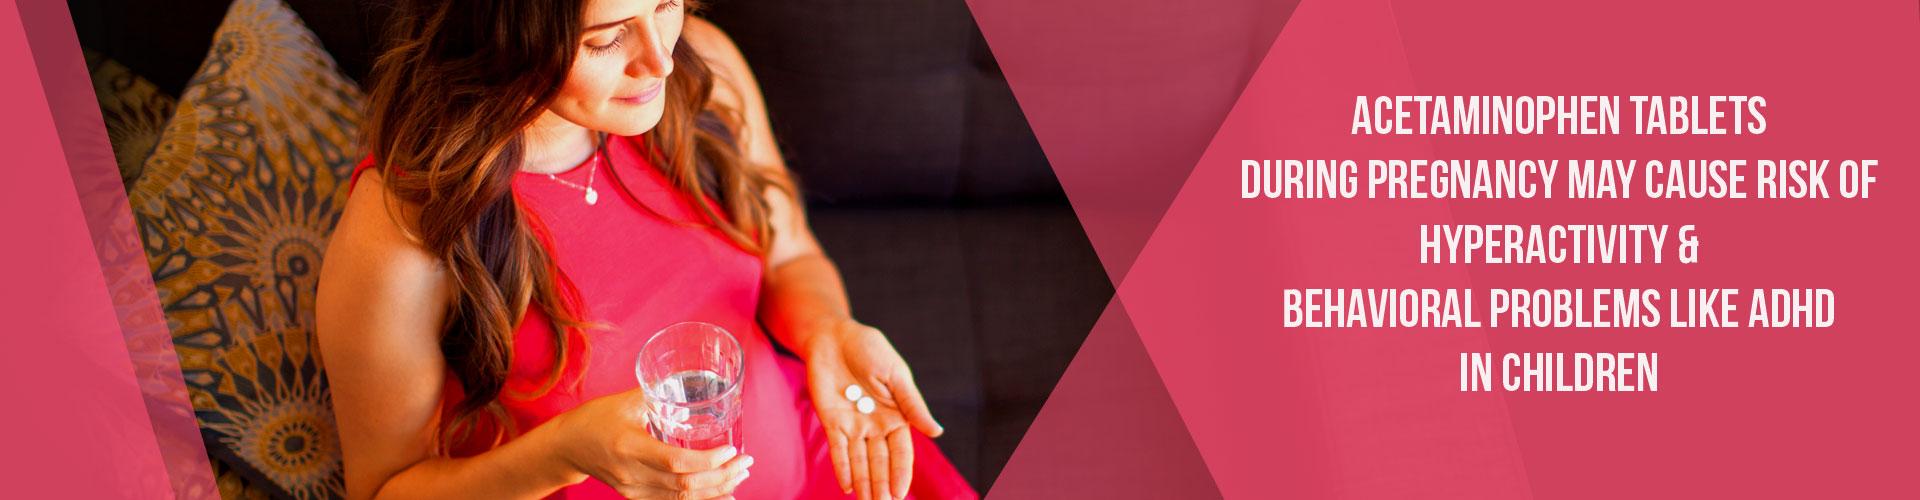 Safe and Harmful Drugs in Pregnancy